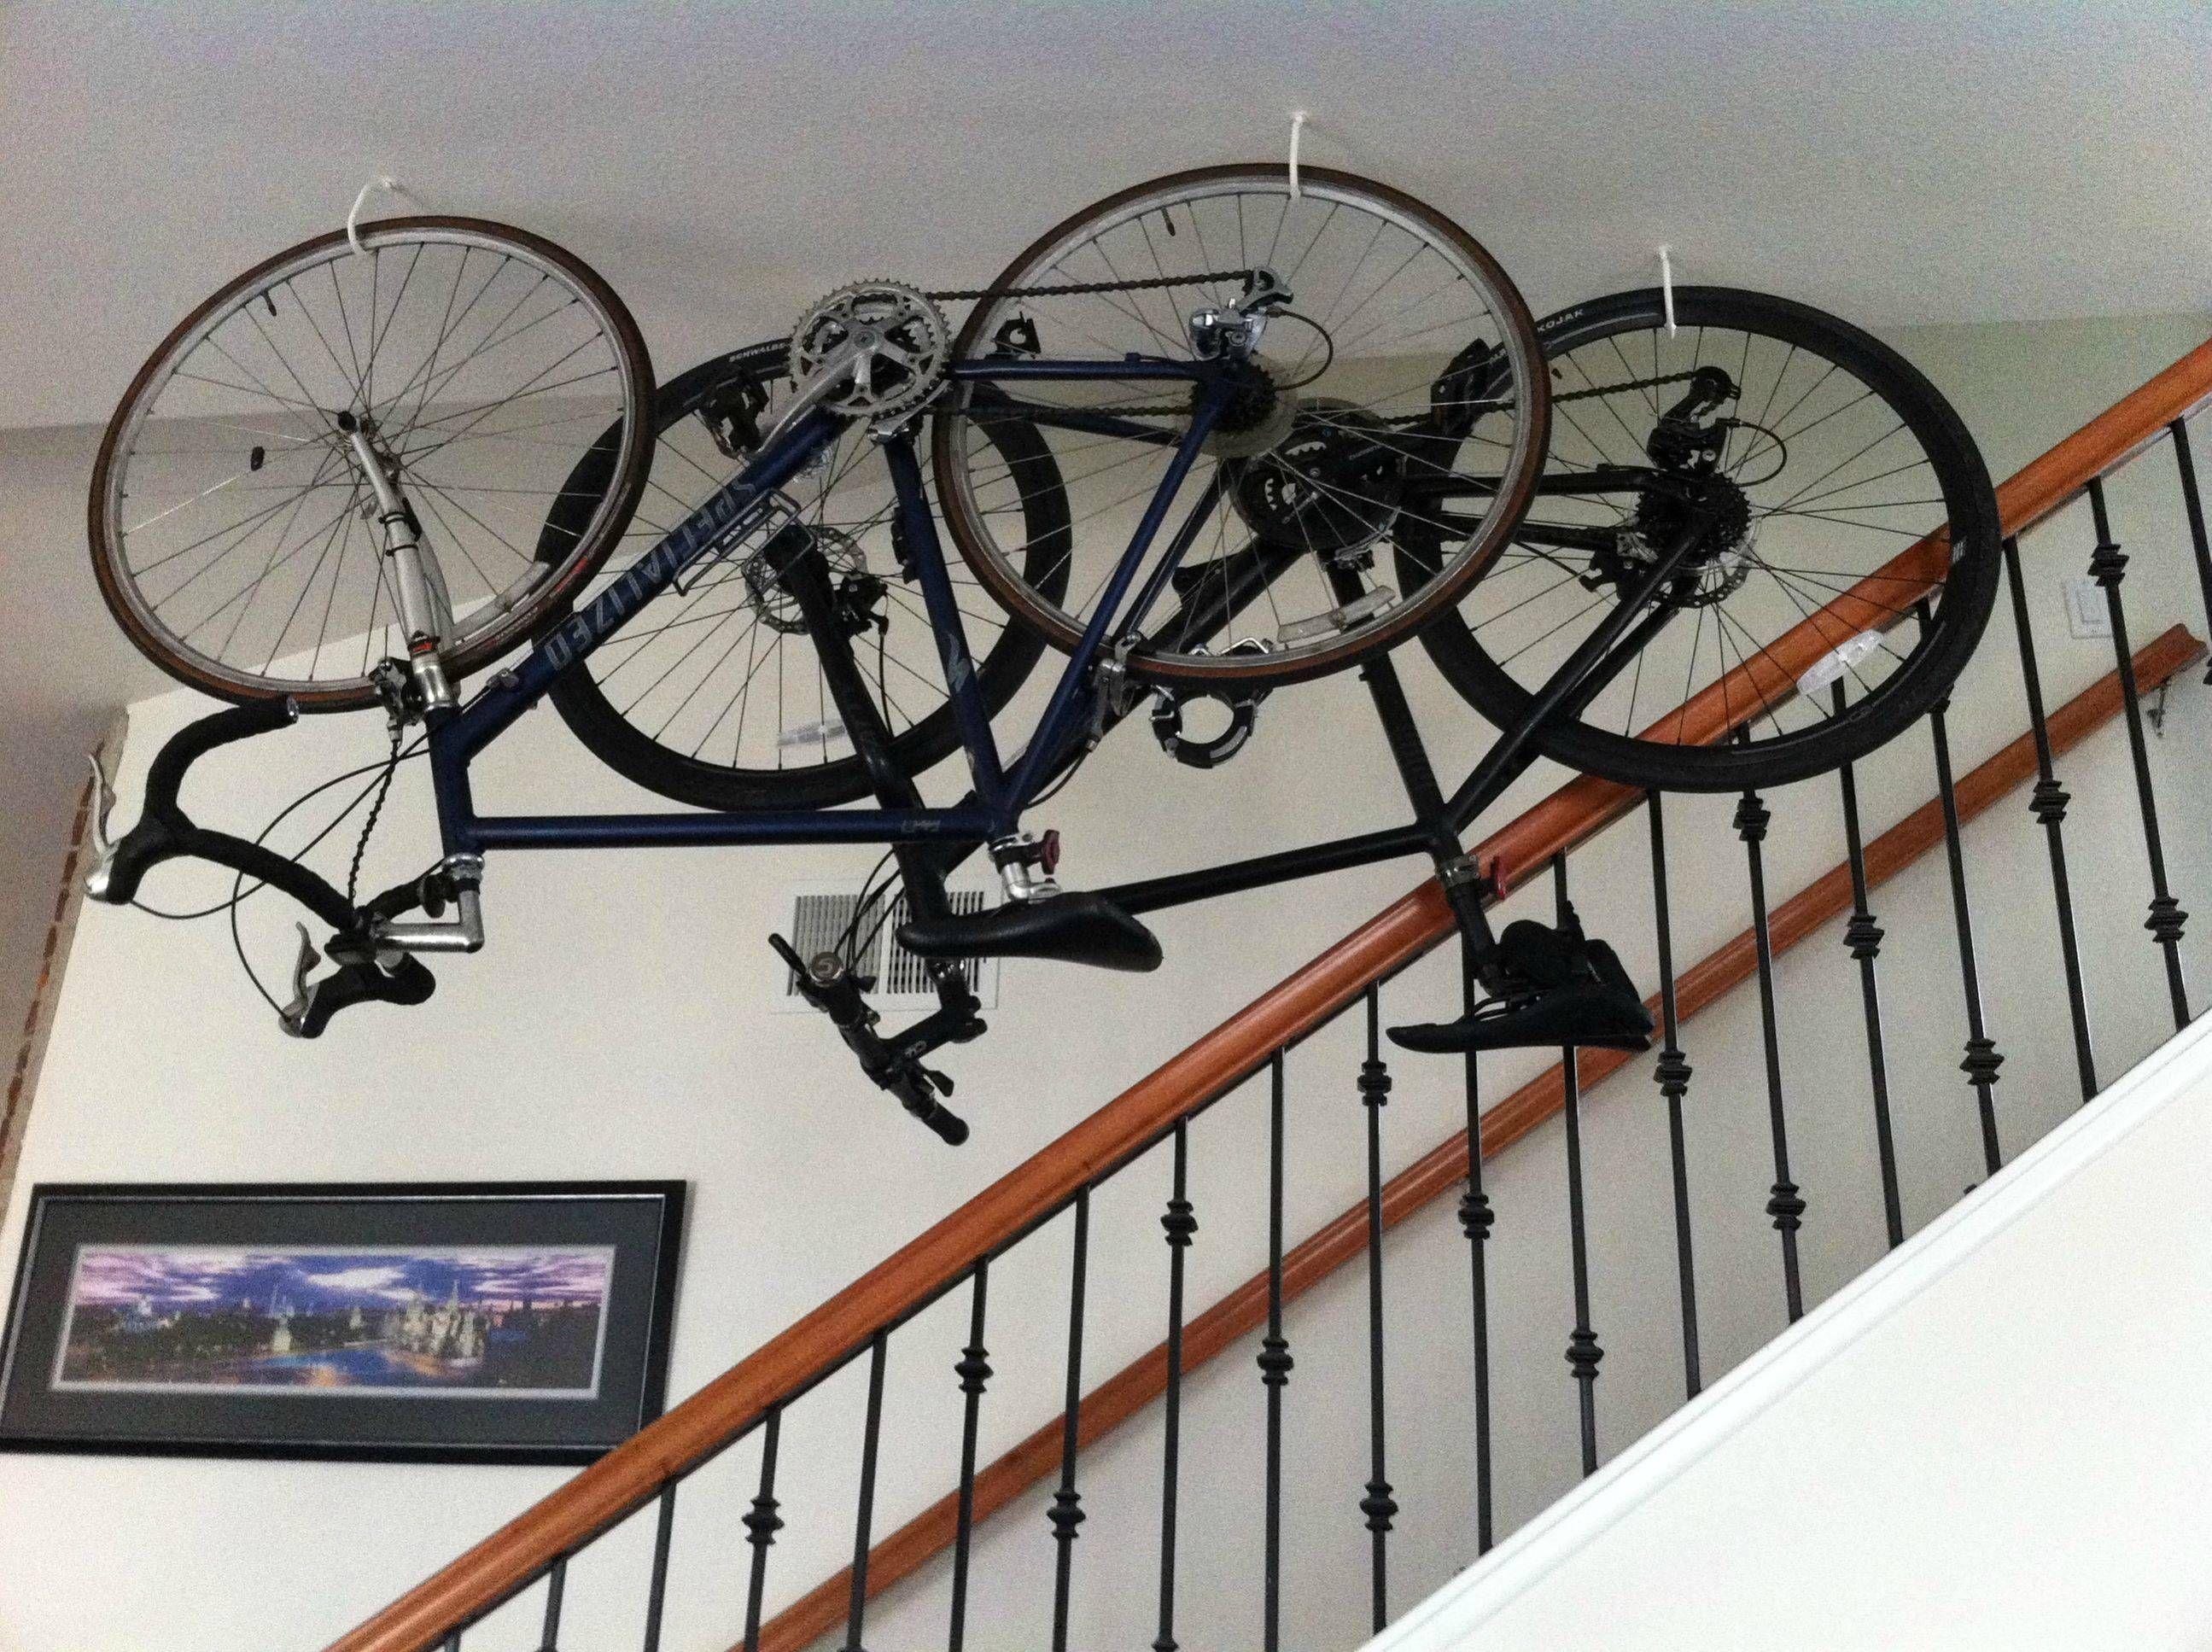 Hanging Bikes From Ceiling Apartment Google Search Bike Hanger For Garage Bike Wall Storage Bike Storage Garage